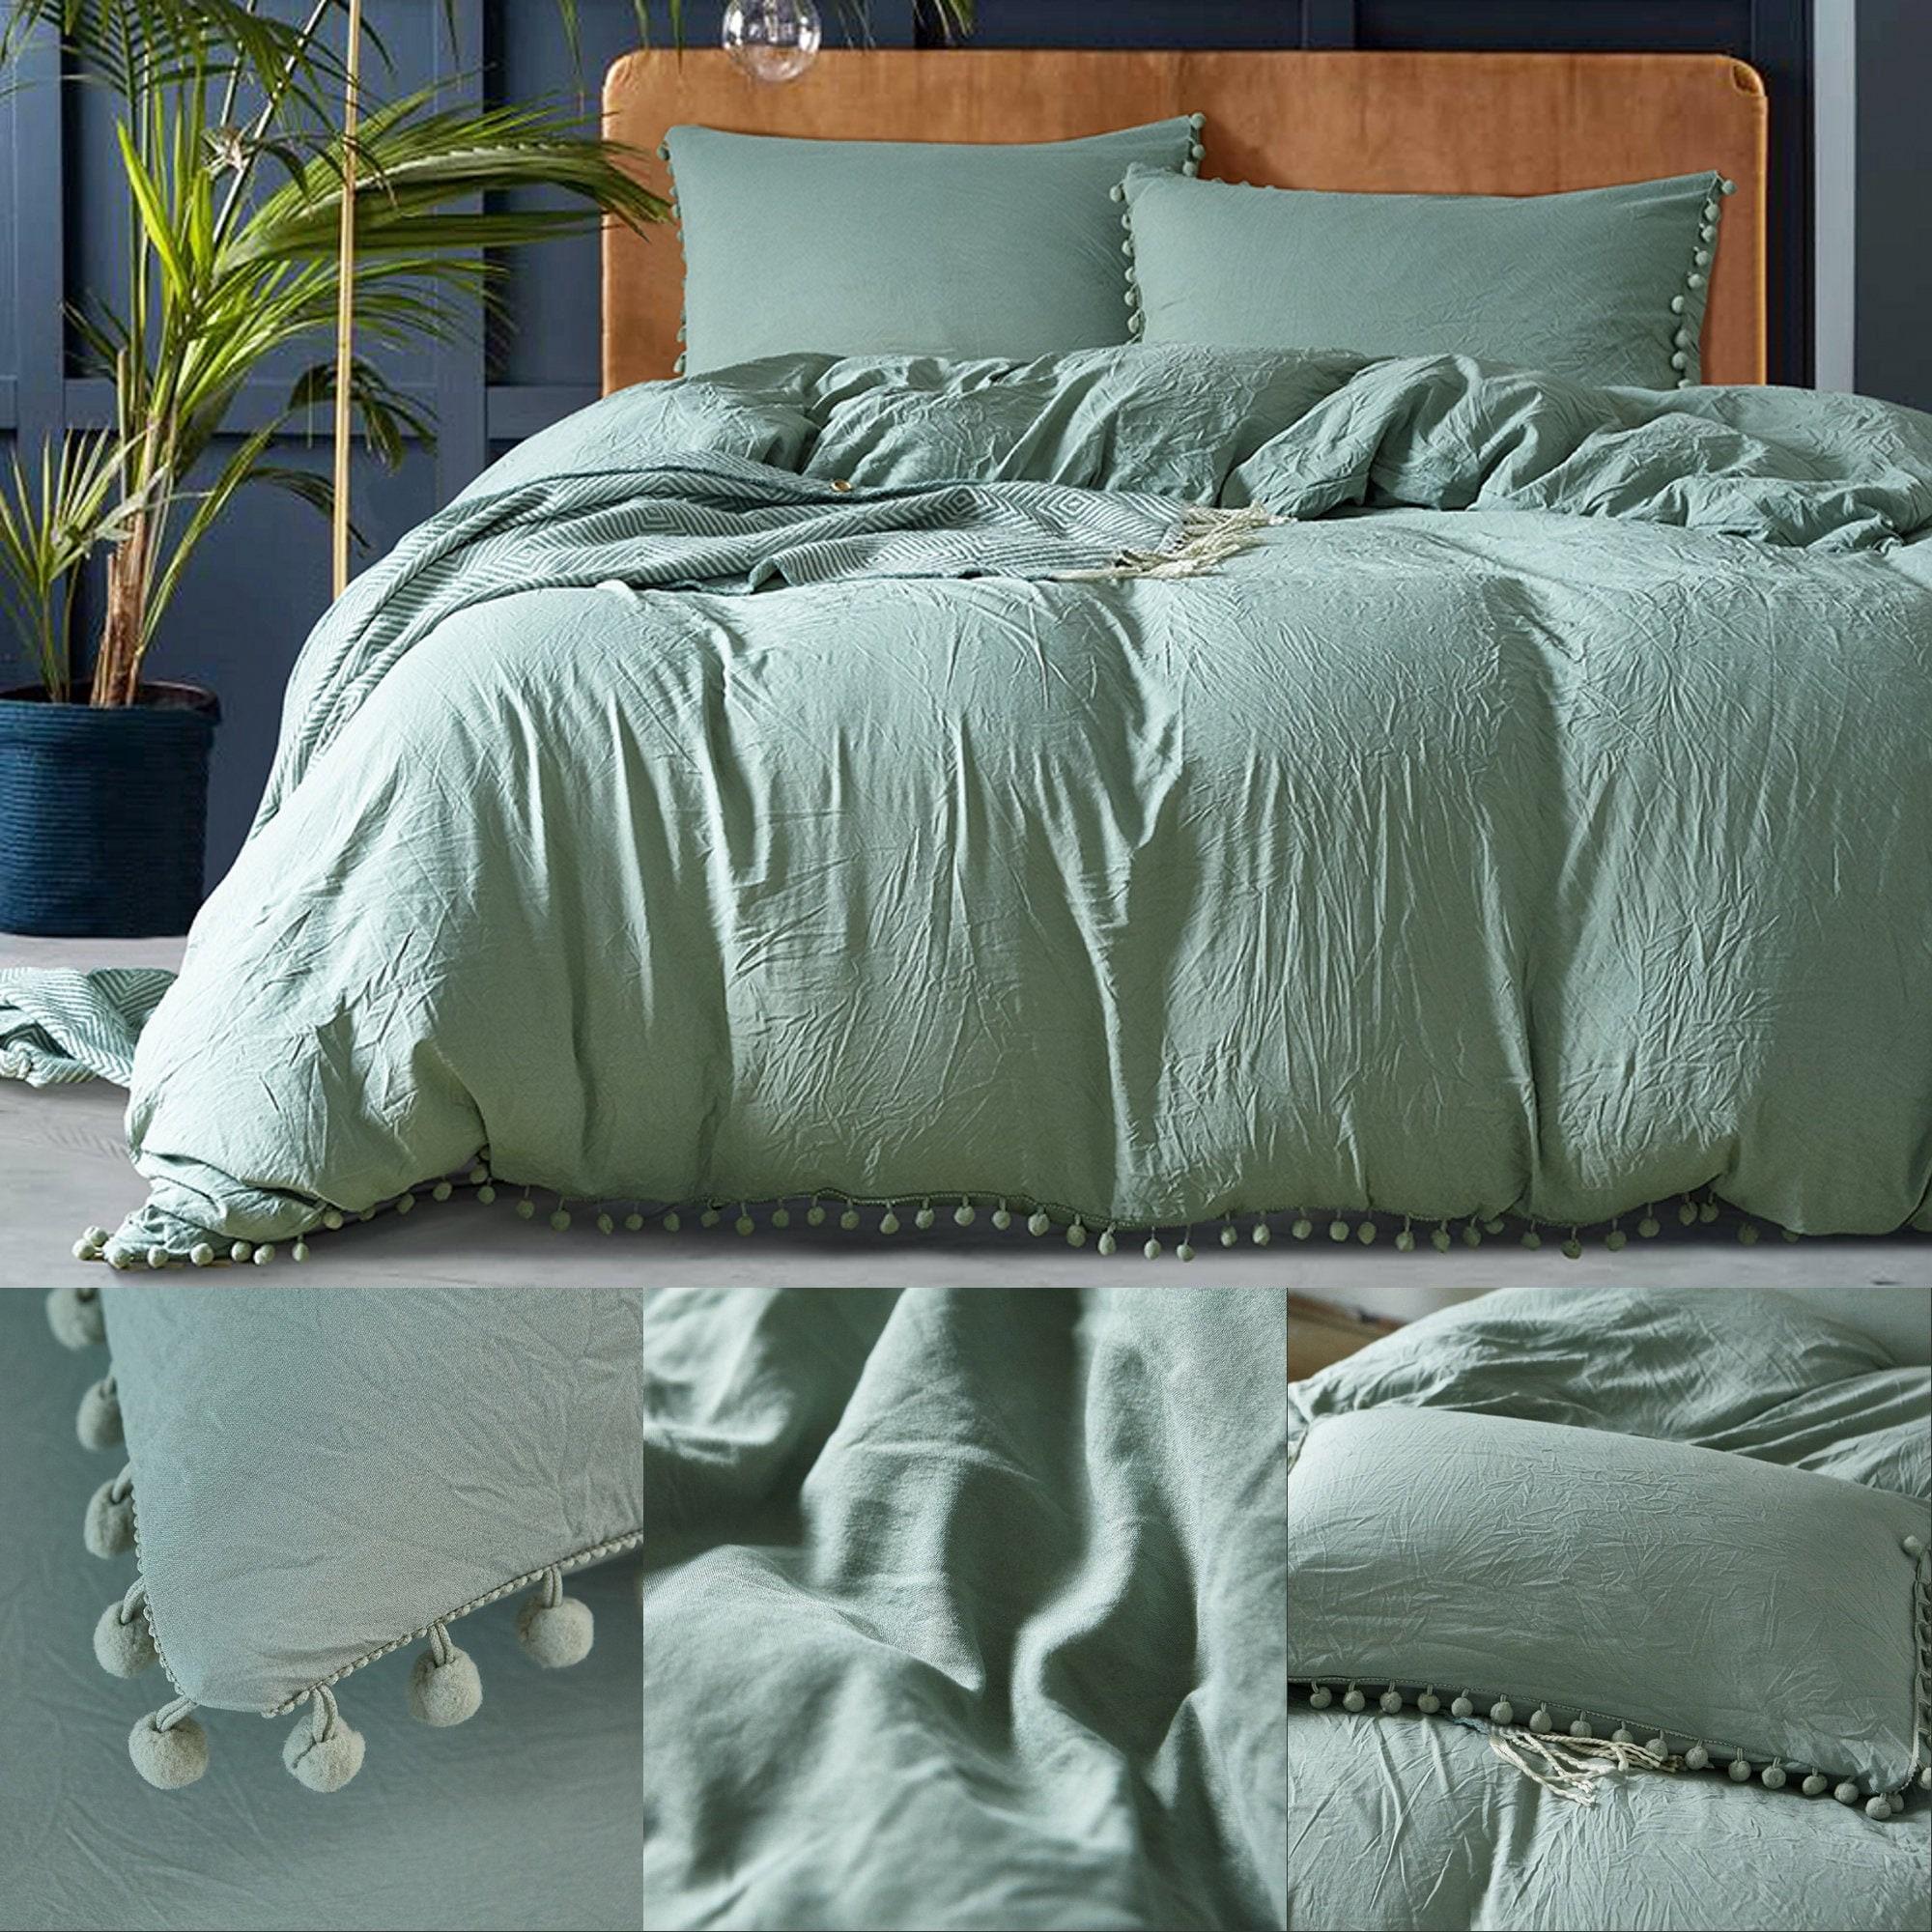 Bohemia Turkish Duvet Cover Set on White,High Quality Handmade Duvet Cover,Cushion Cover,Gift for Couple,Premium Quality,Sale!